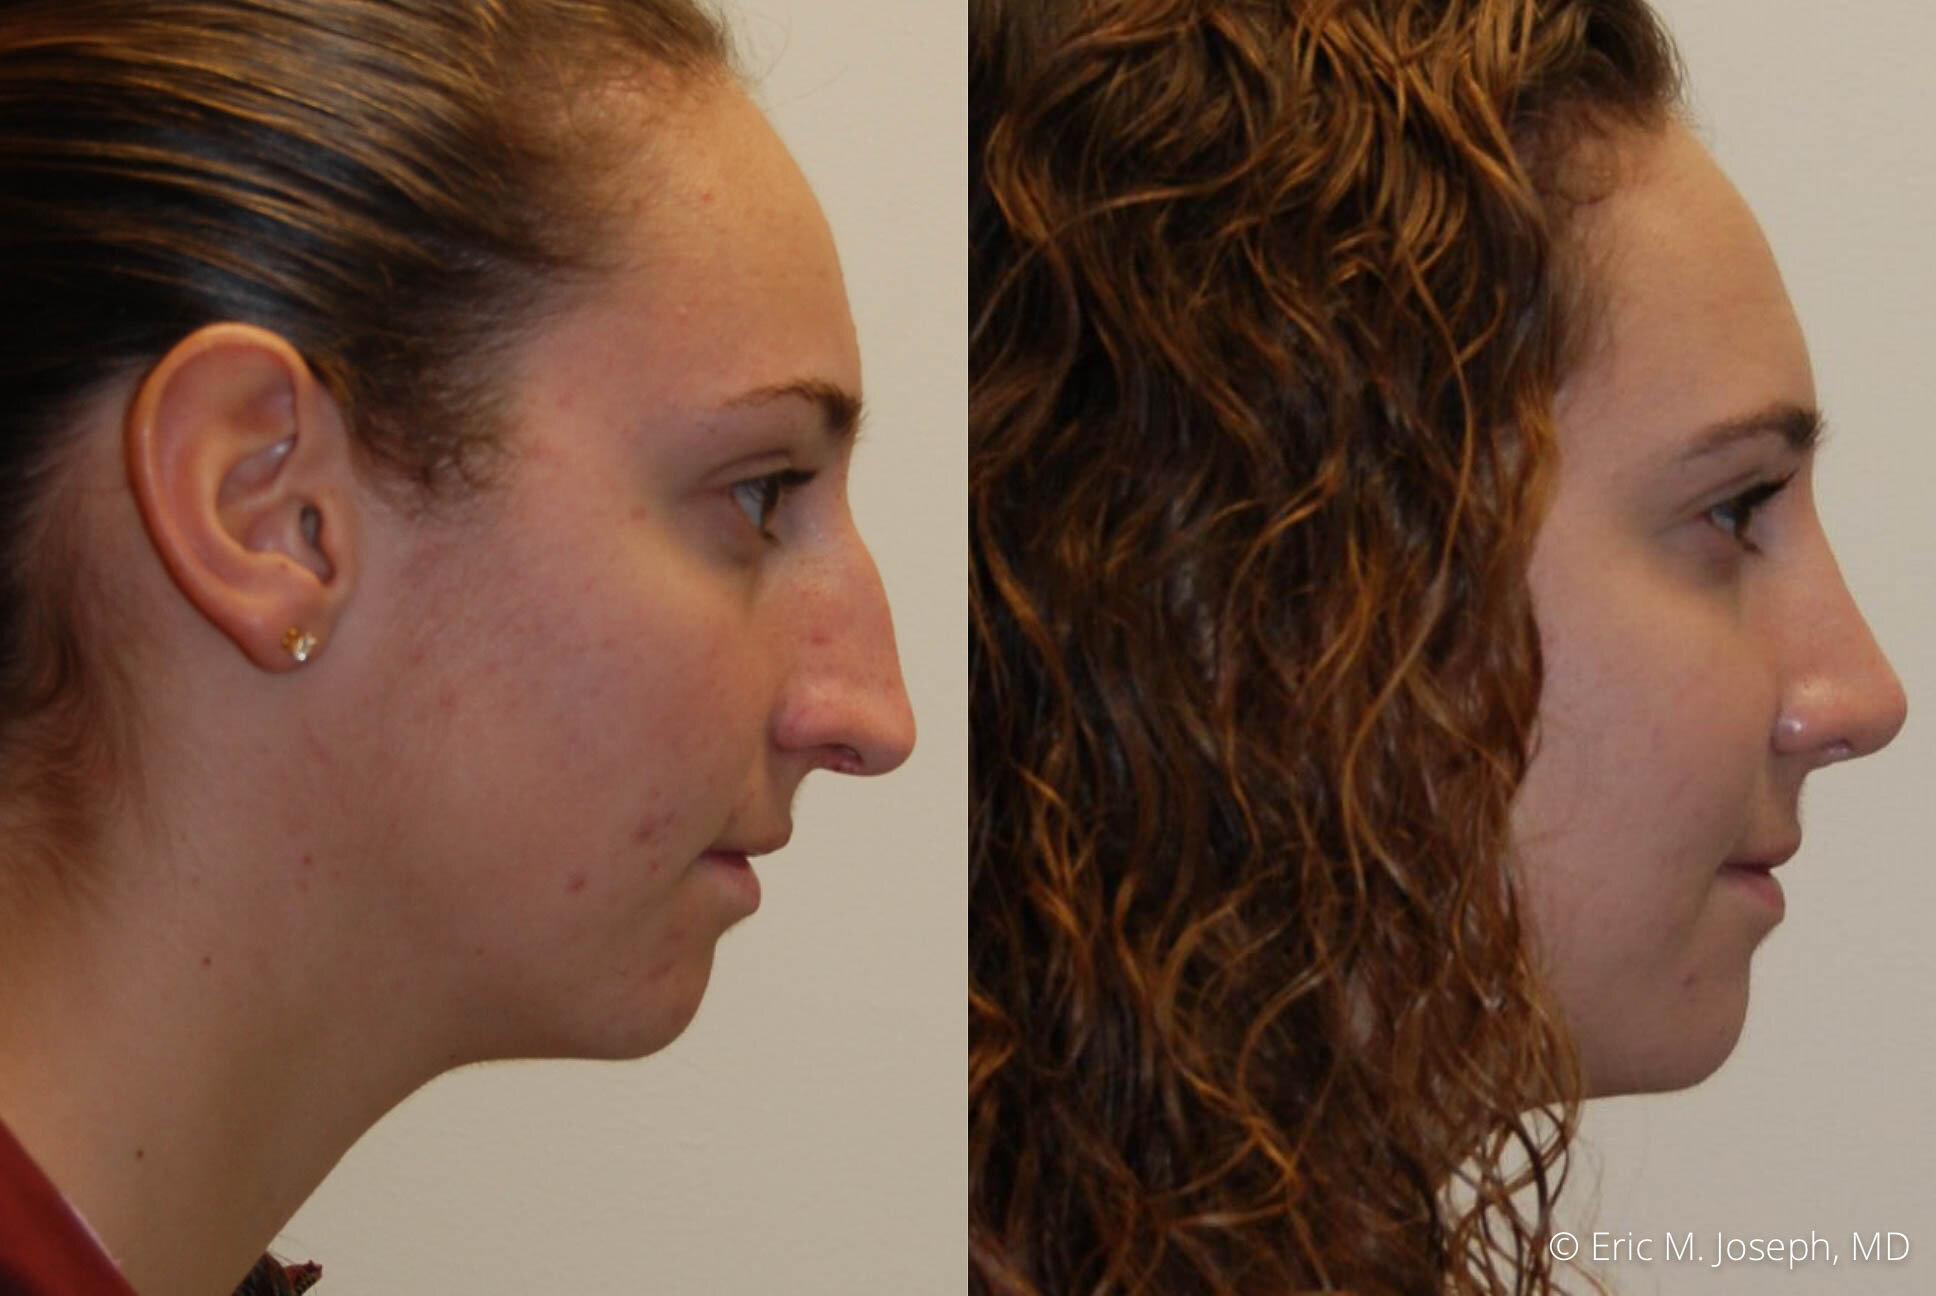 rhinoplasty-nj-expert-nyc-0393.jpg